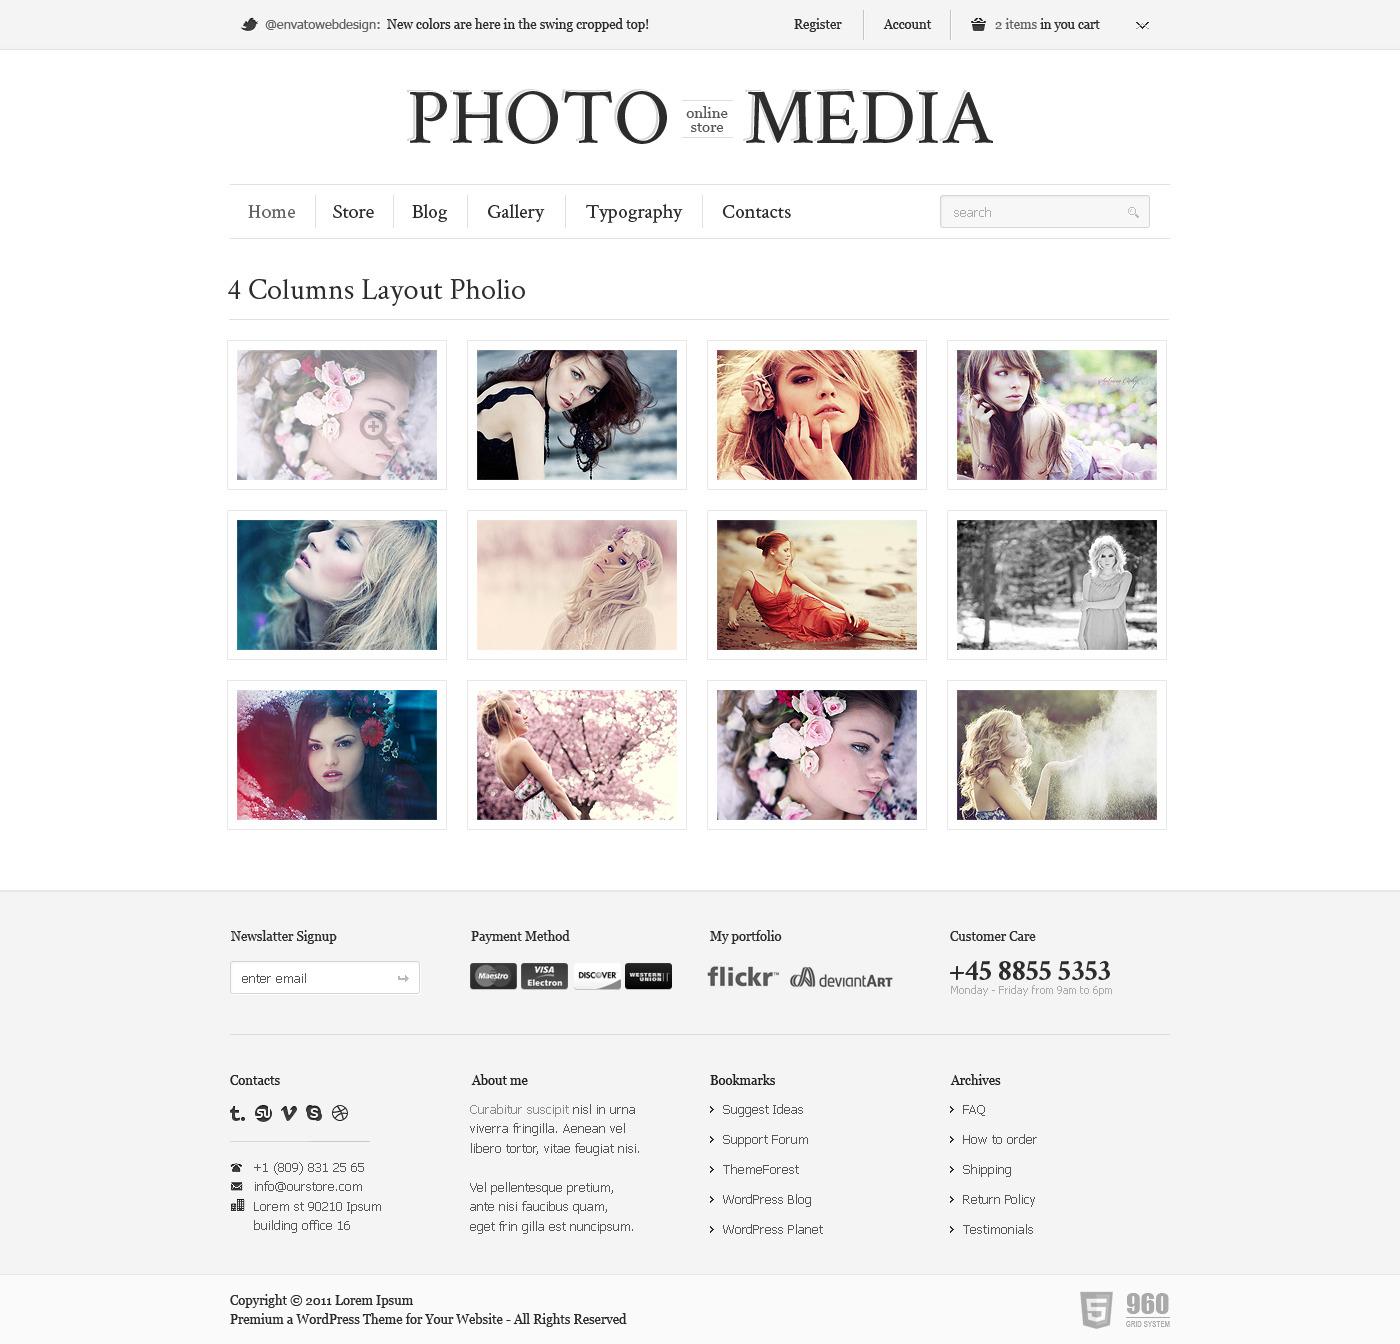 Phomedia Wordpress Theme - A WP E-Commerce theme - Portfolio page overview